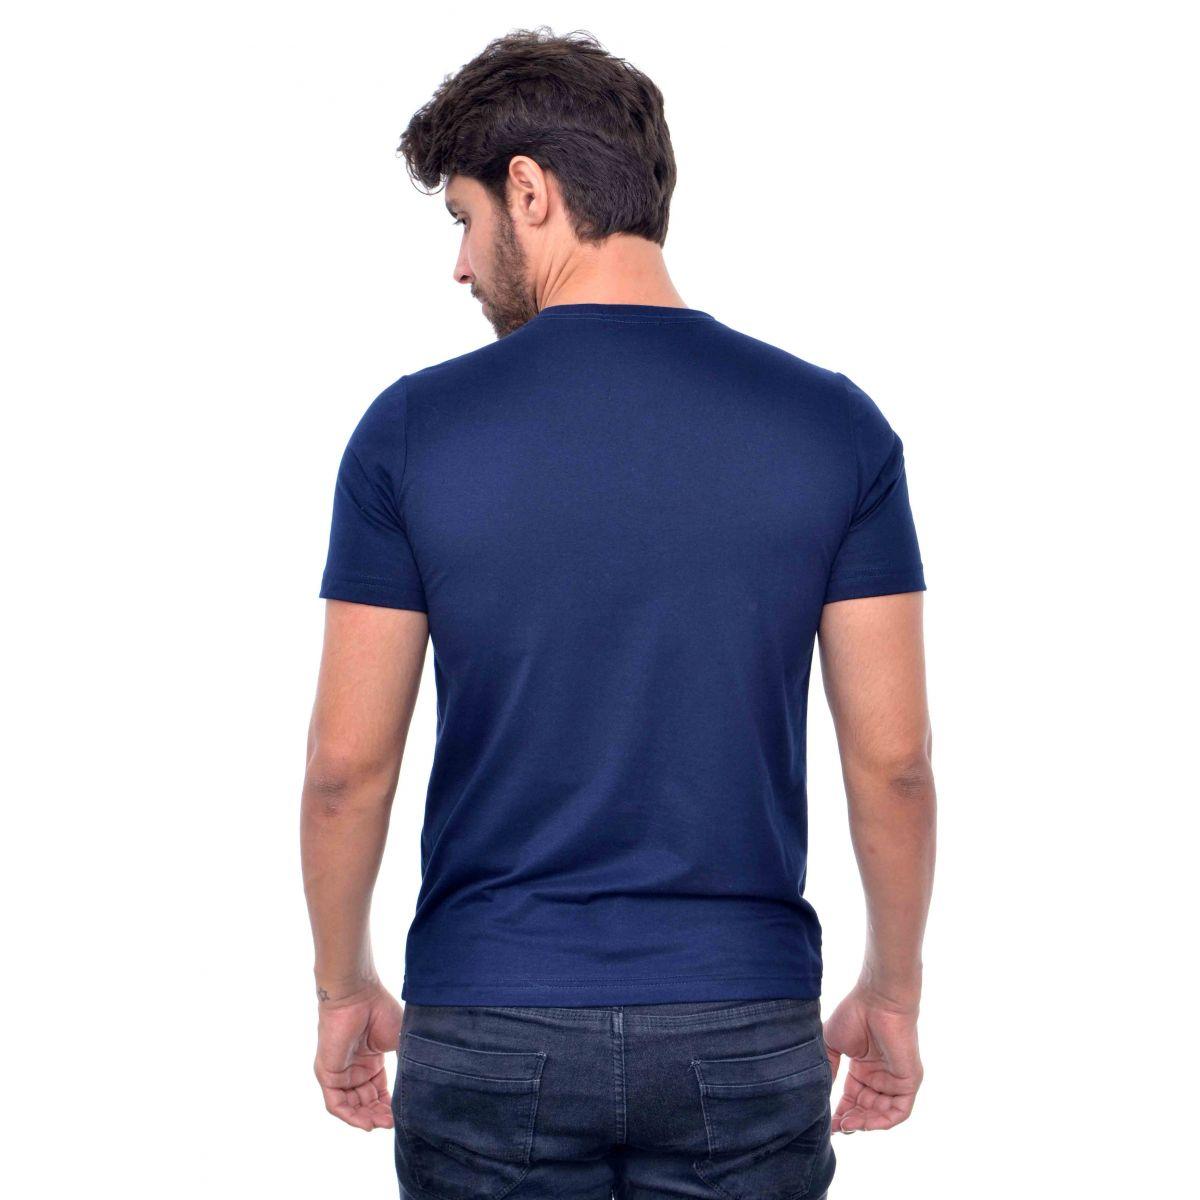 Camiseta Basic RL Azul Marinho  - Ca Brasileira